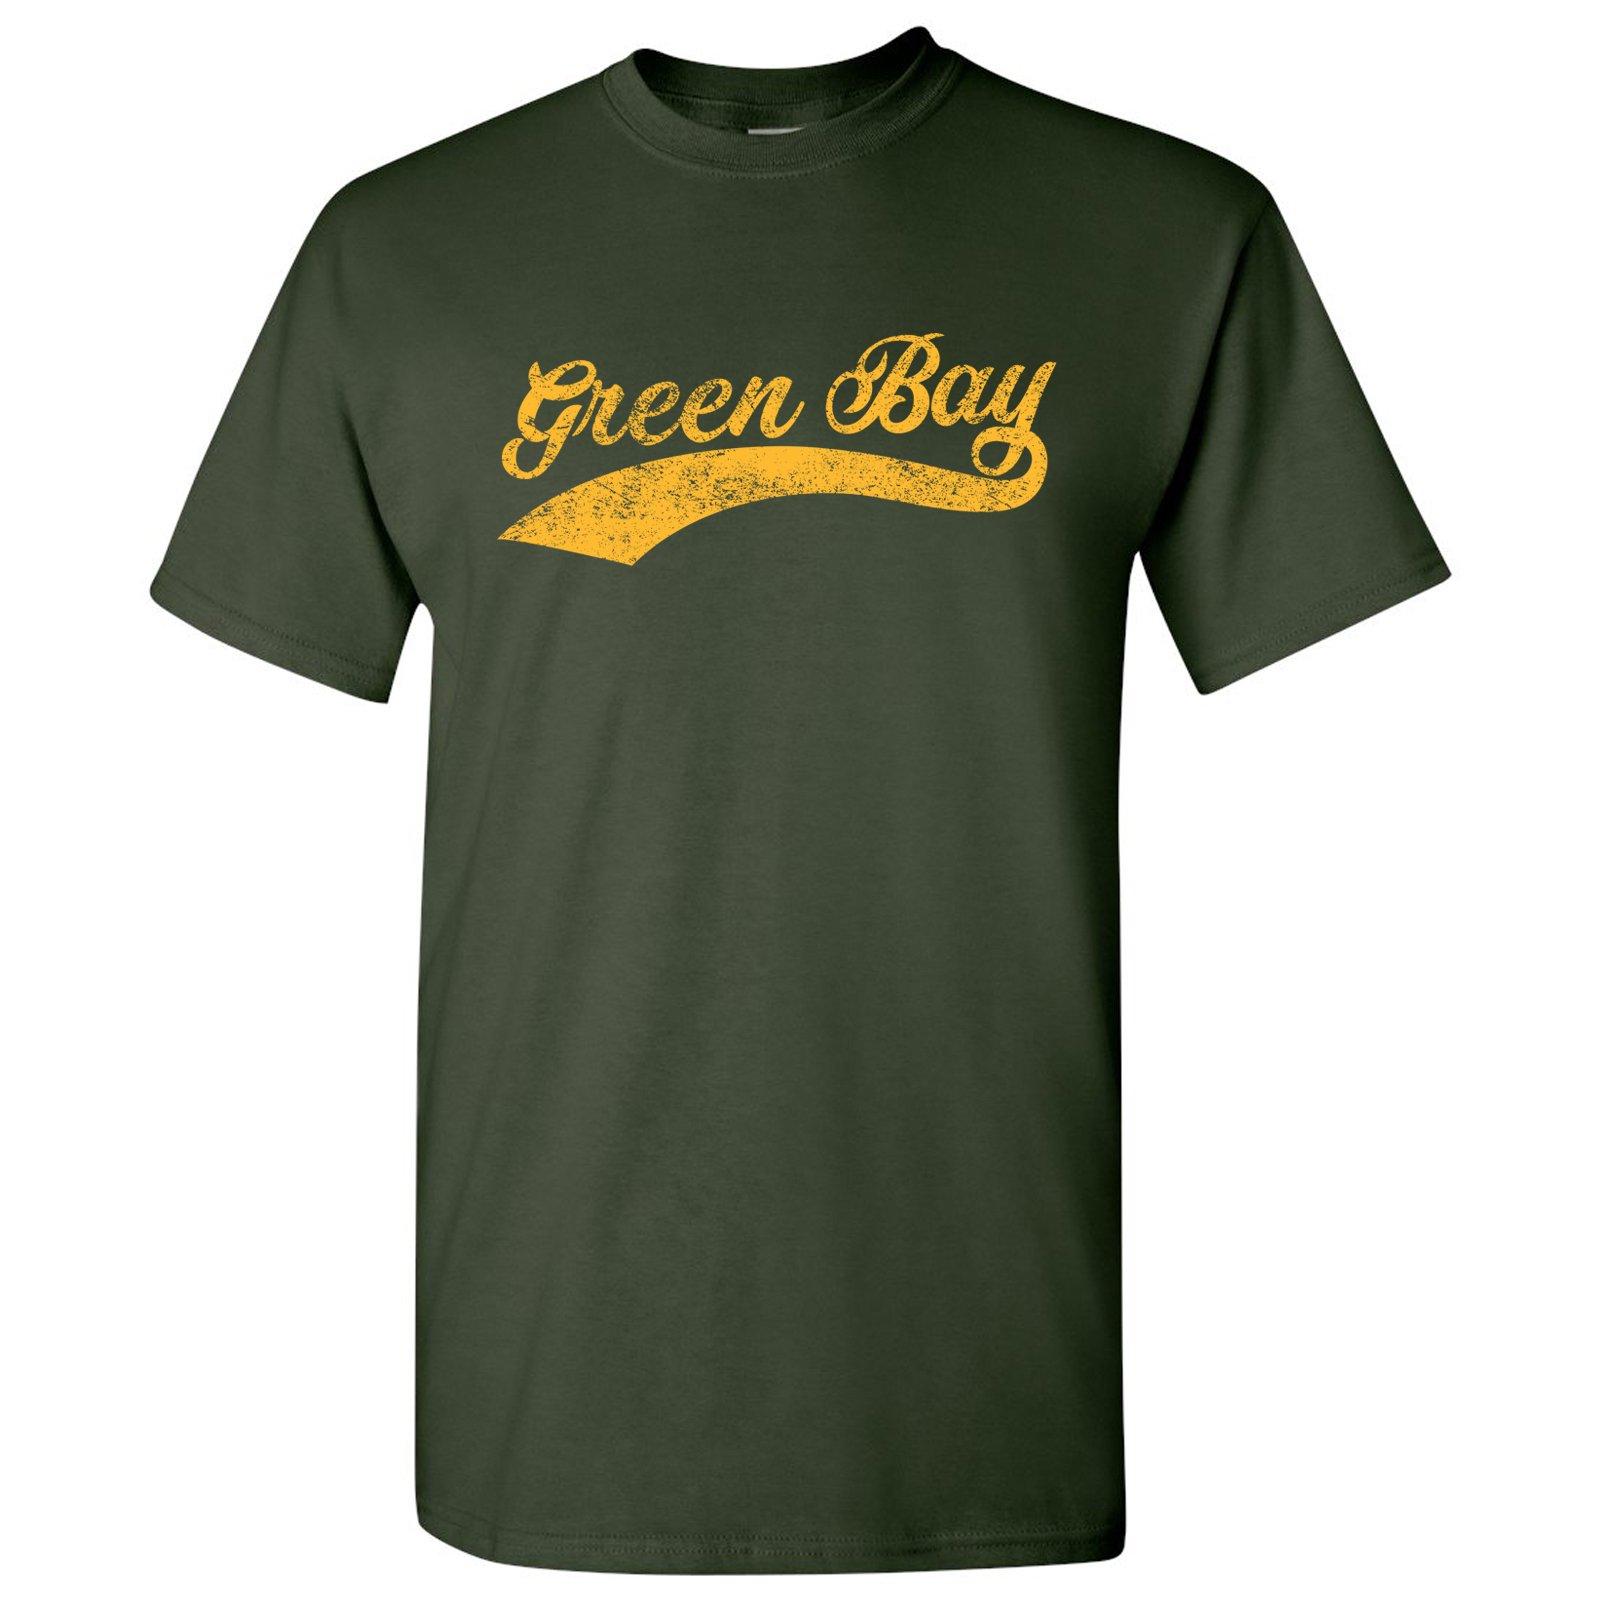 Green Bay City Script - Baseball, League, Homerun, Majors, Hometown Pride T-Shirt - 3X-Large - Forest